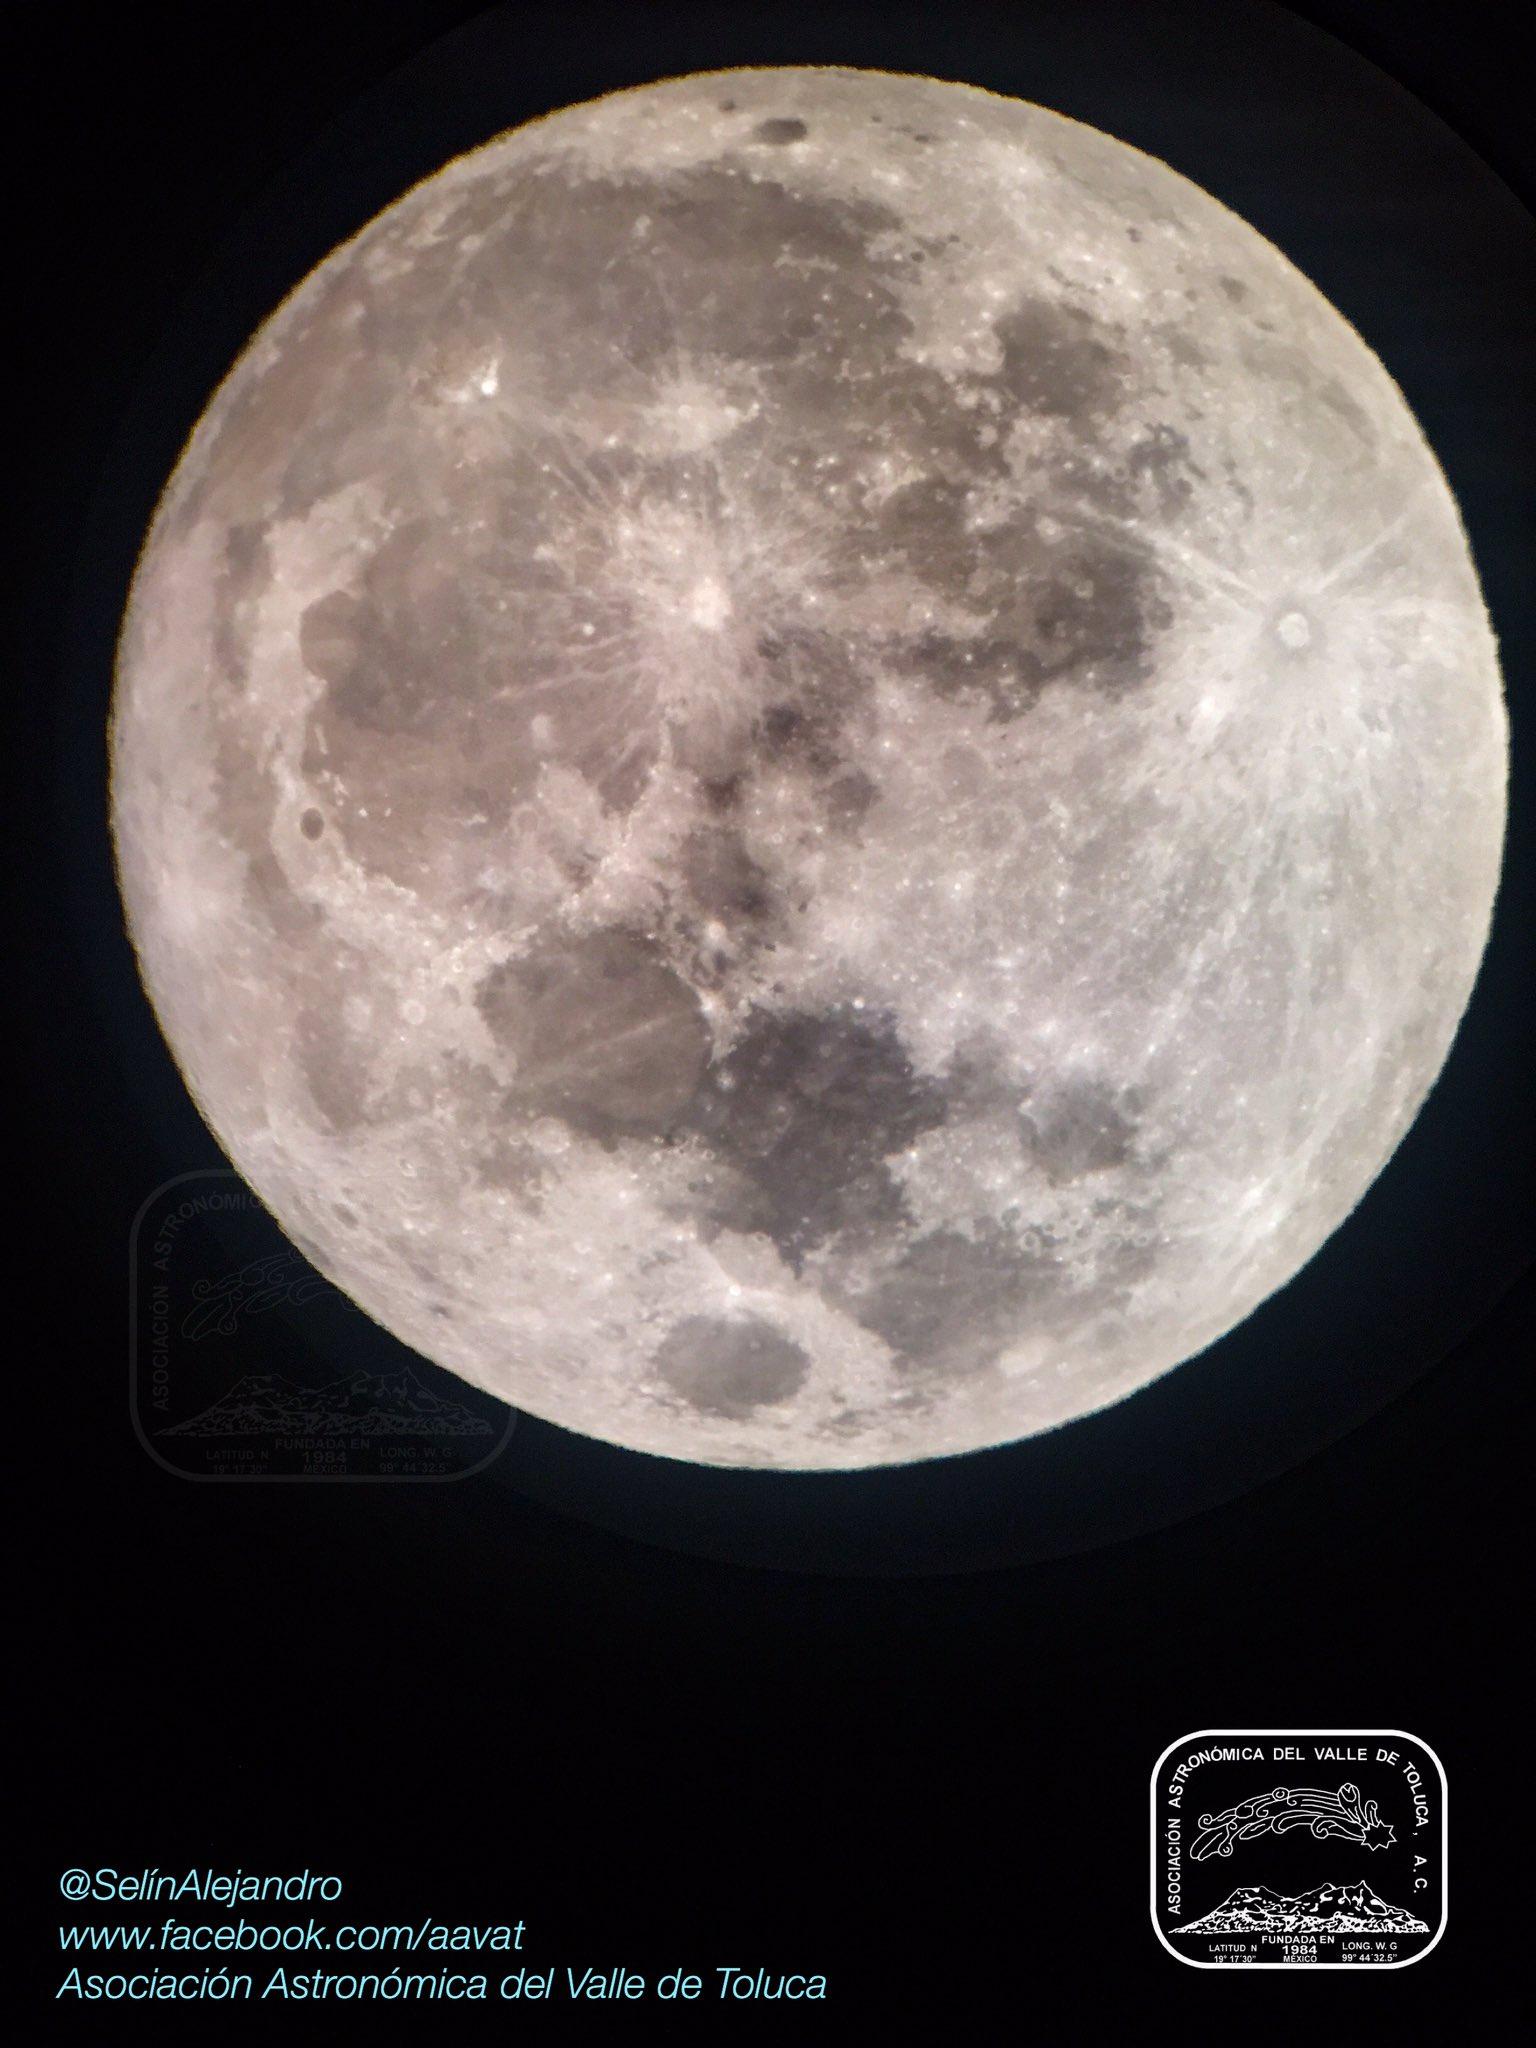 @webcamsdemexico Hermosa Luna Llena desde Toluca, México. https://t.co/x7yKJBzhfg